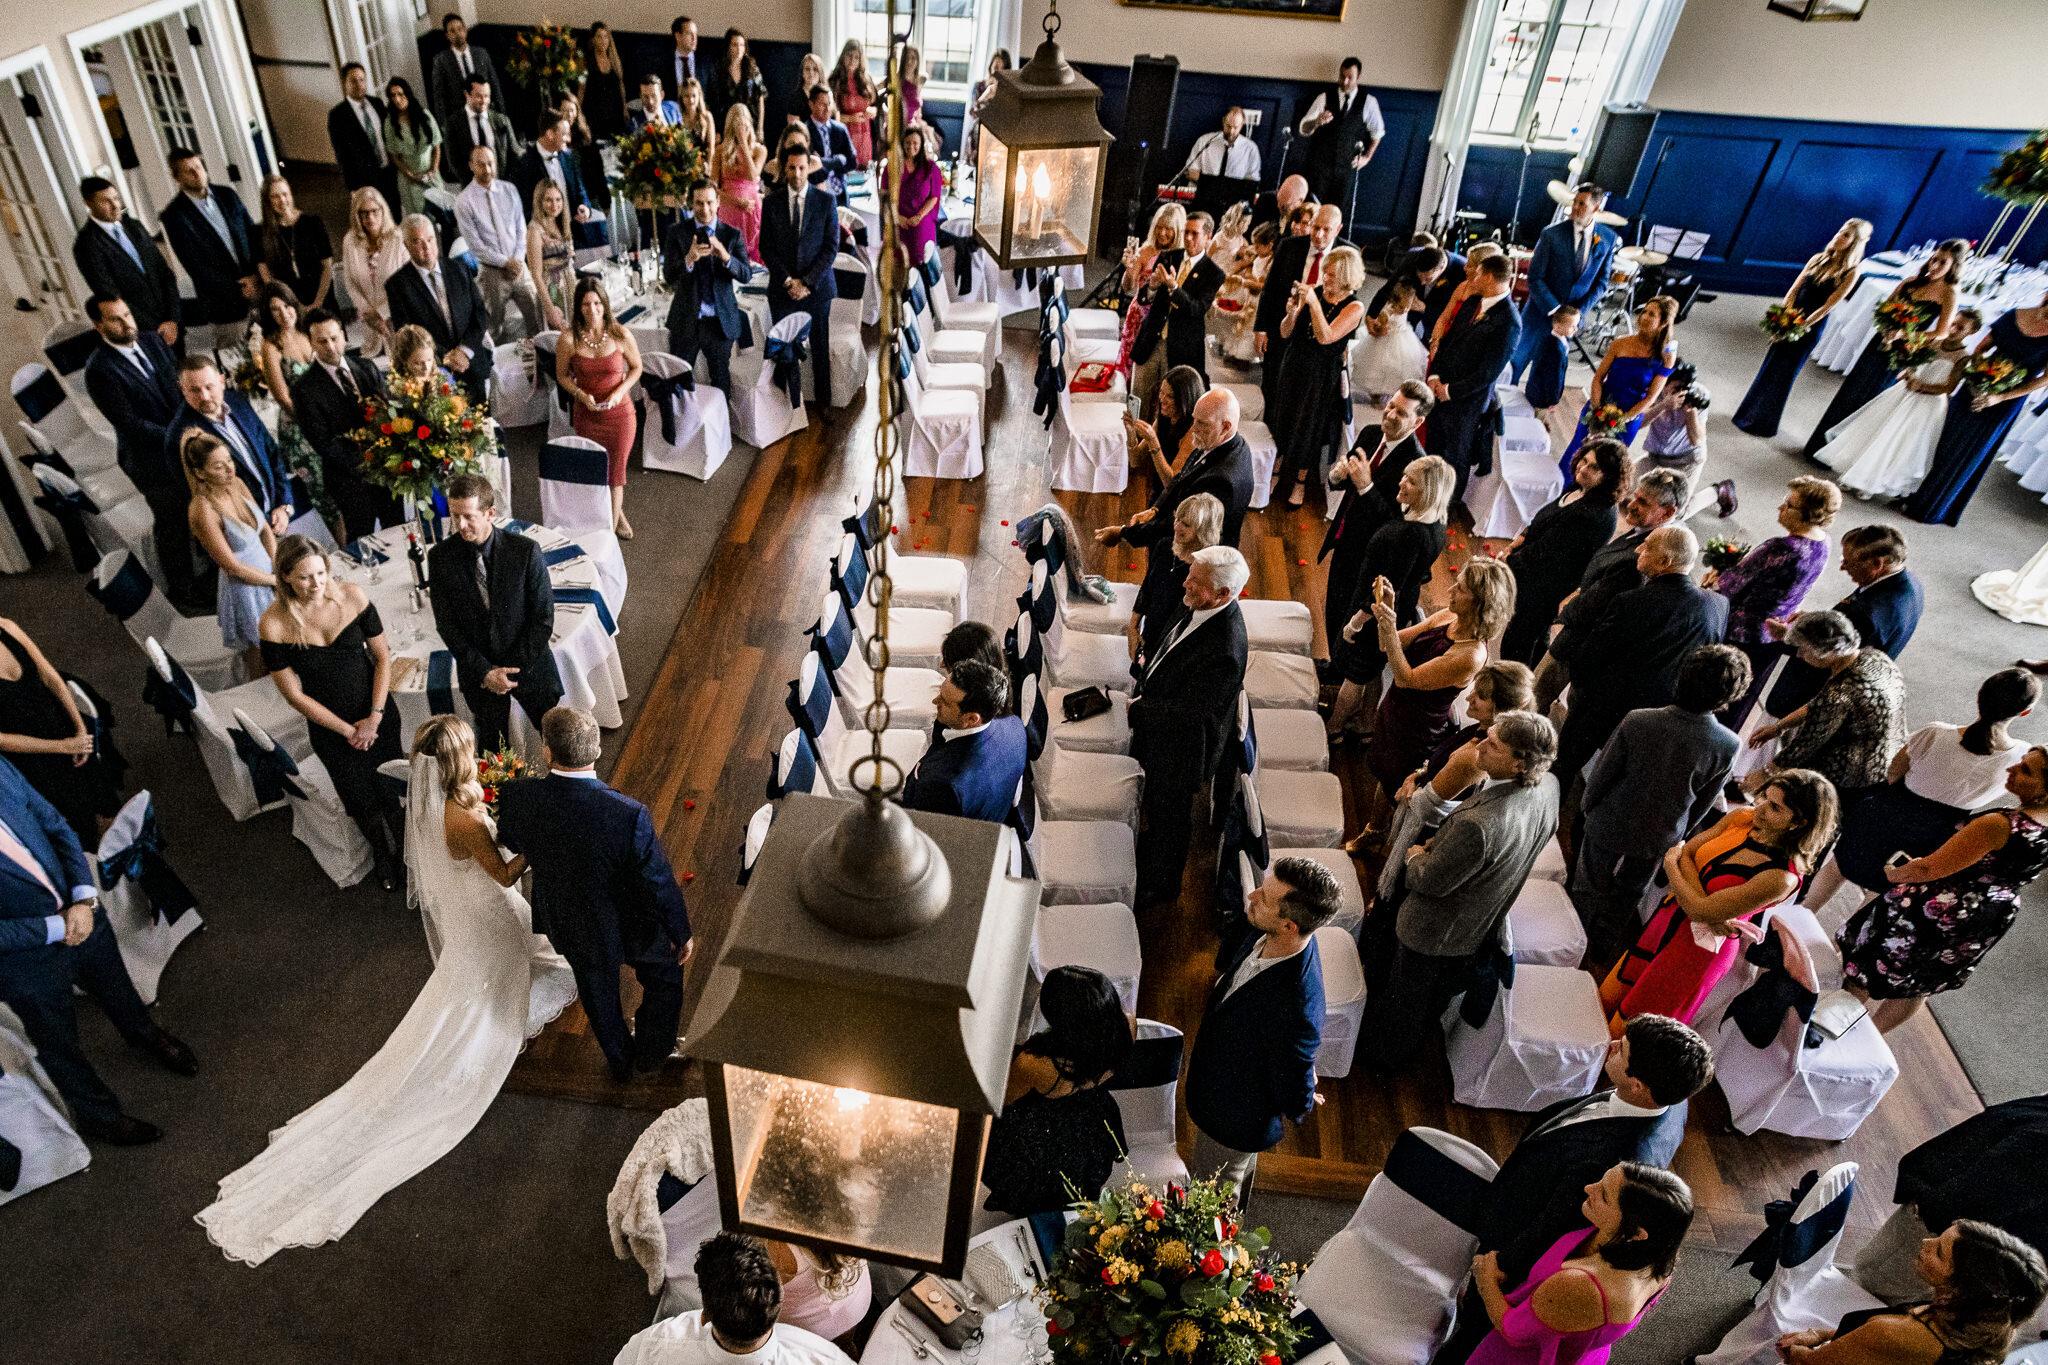 Snell-Ocean-City-Yacht-Club-New-Jersey-Wedding-Photographer-19.JPG